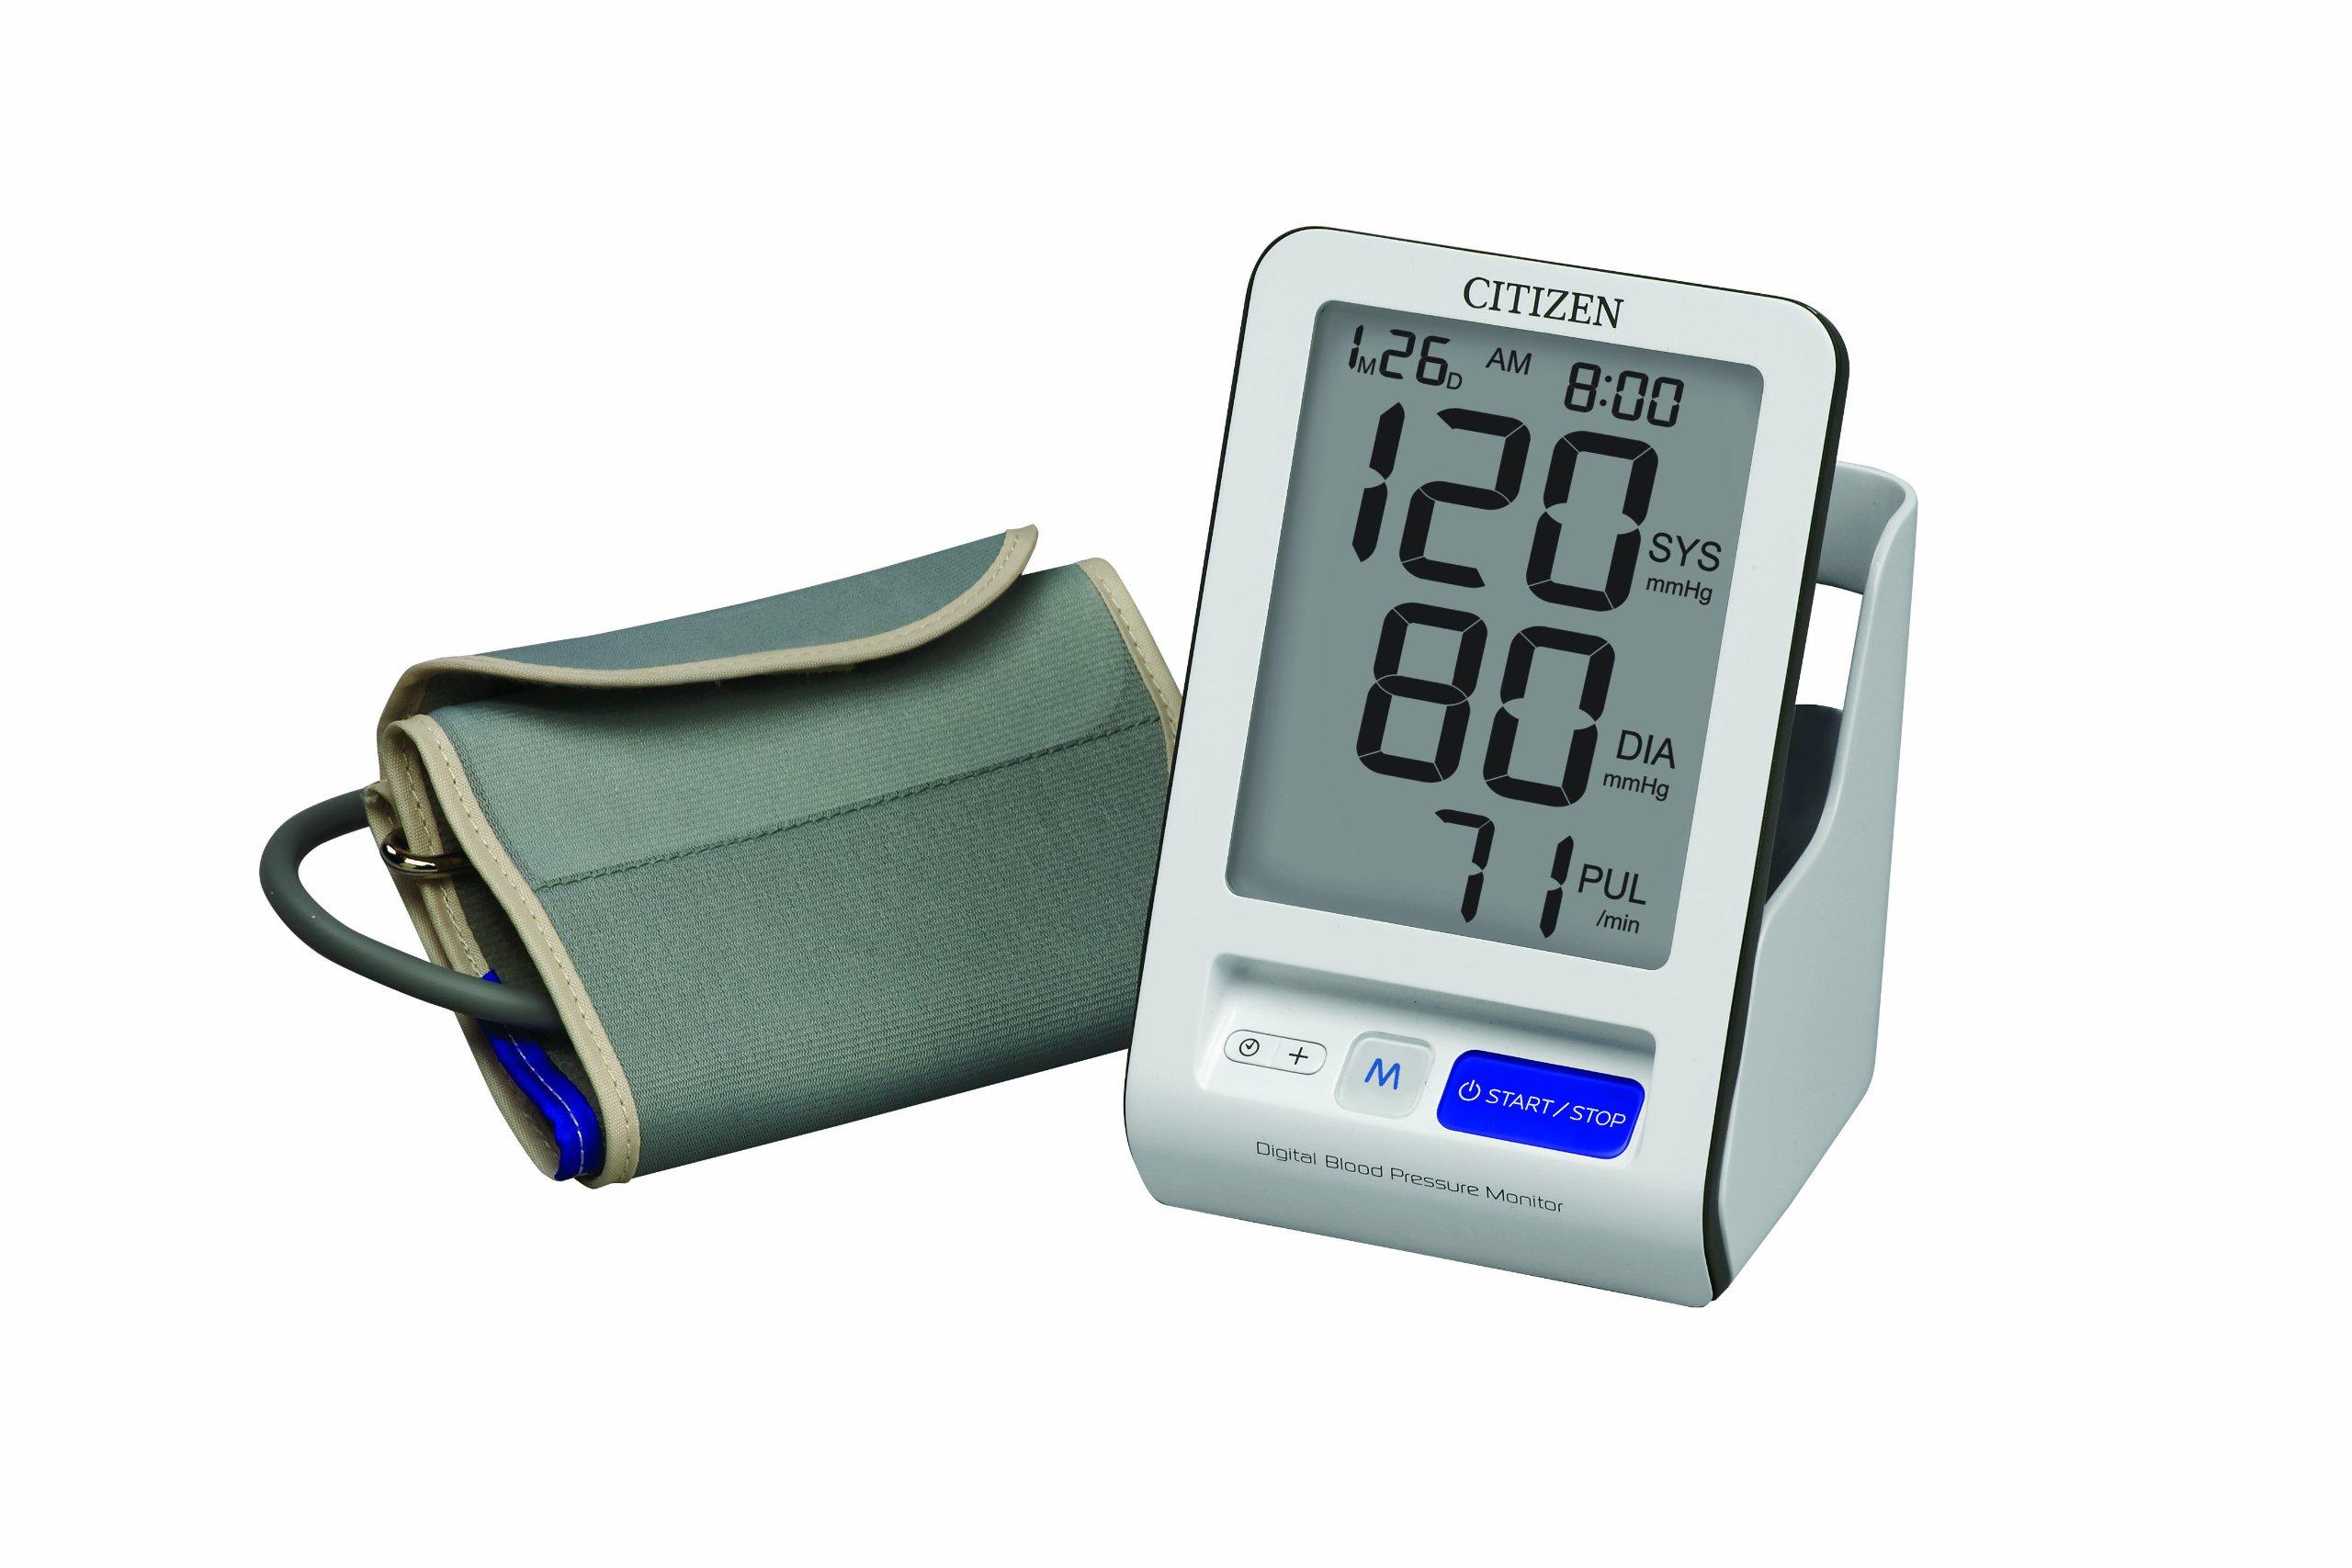 Citizen CH-456 Self-Storing Arm Digital Blood Pressure Monitor